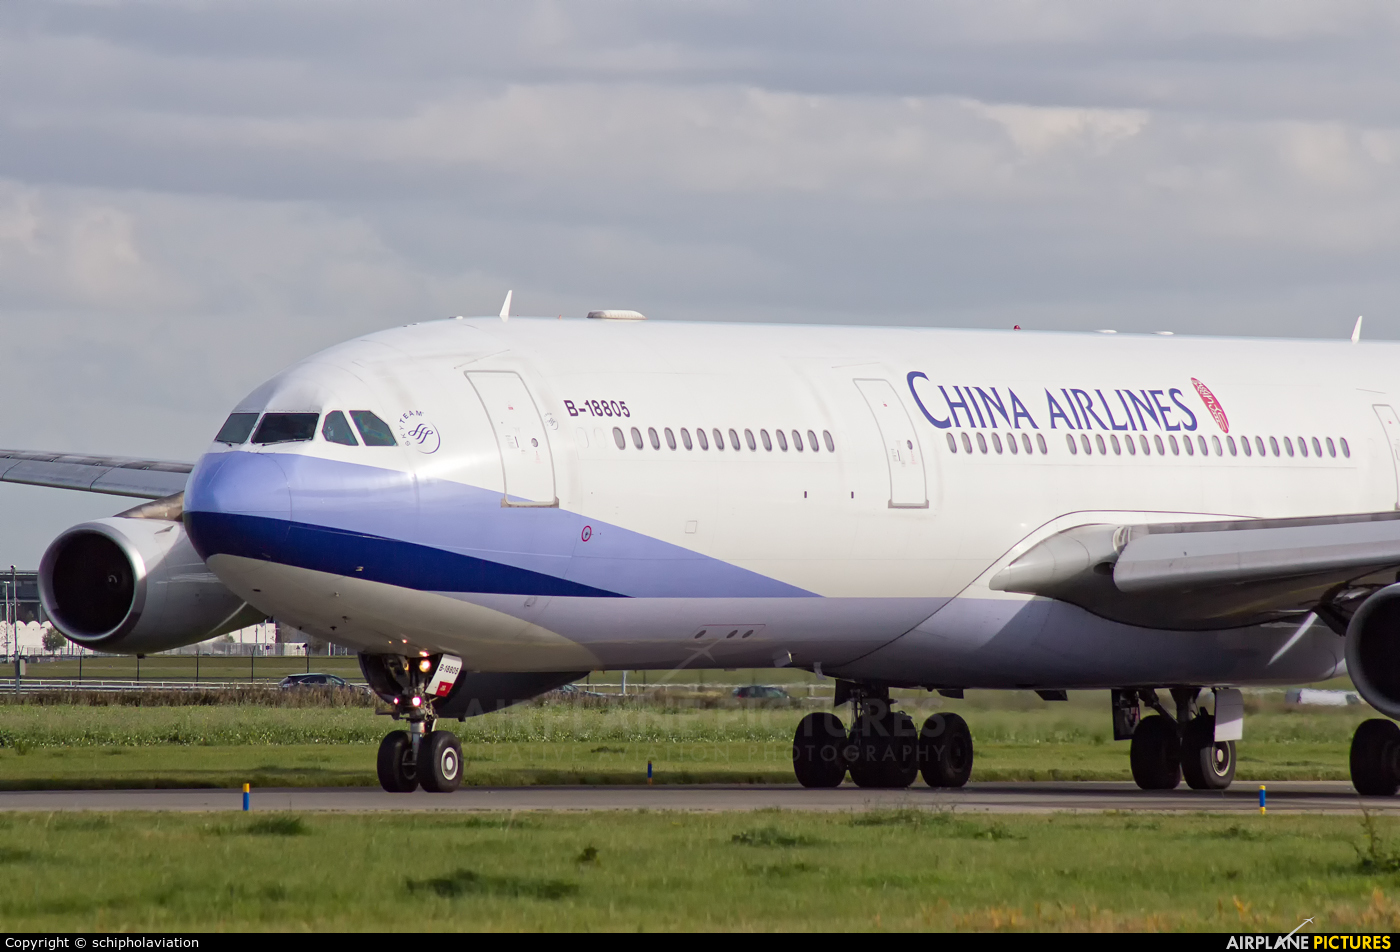 China Airlines B-18805 aircraft at Amsterdam - Schiphol